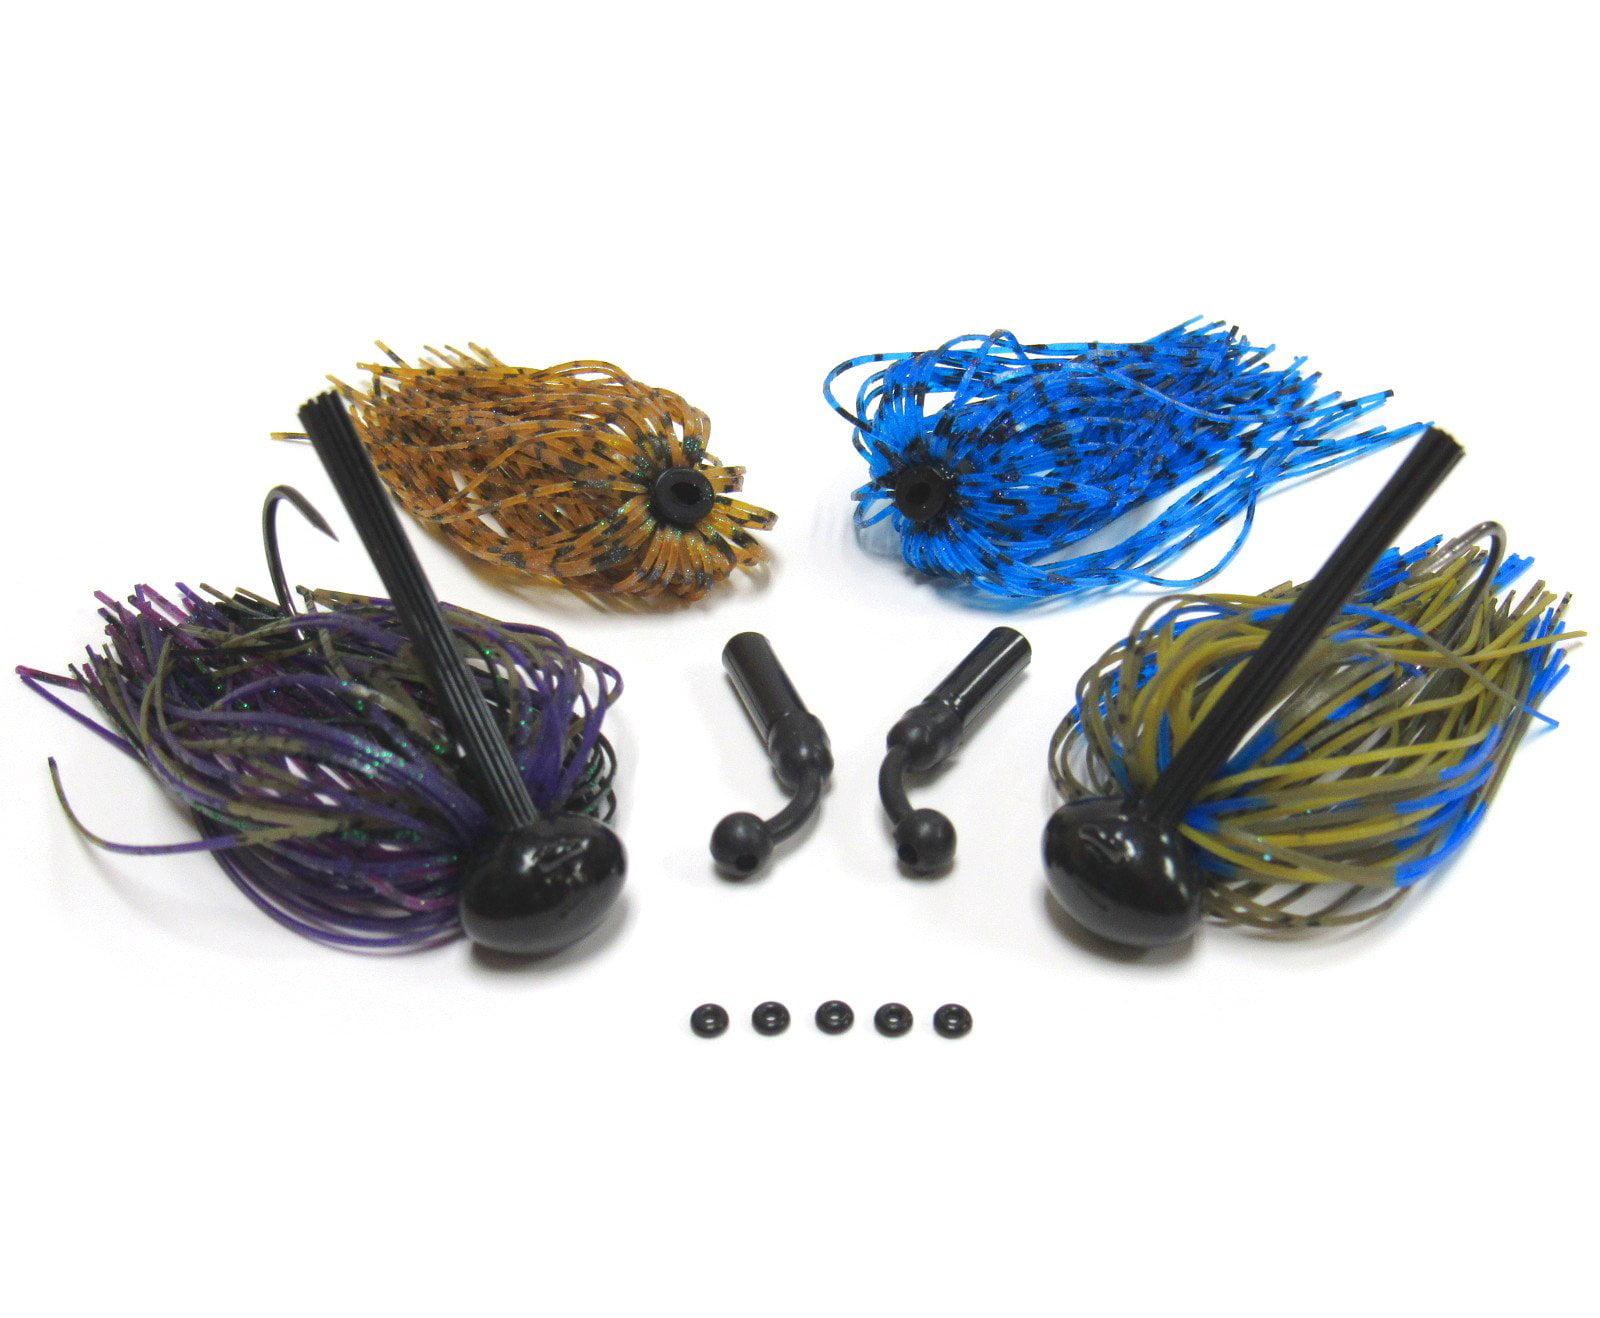 1//2 oz 3 Custom Bass Football Jigs Black Blue